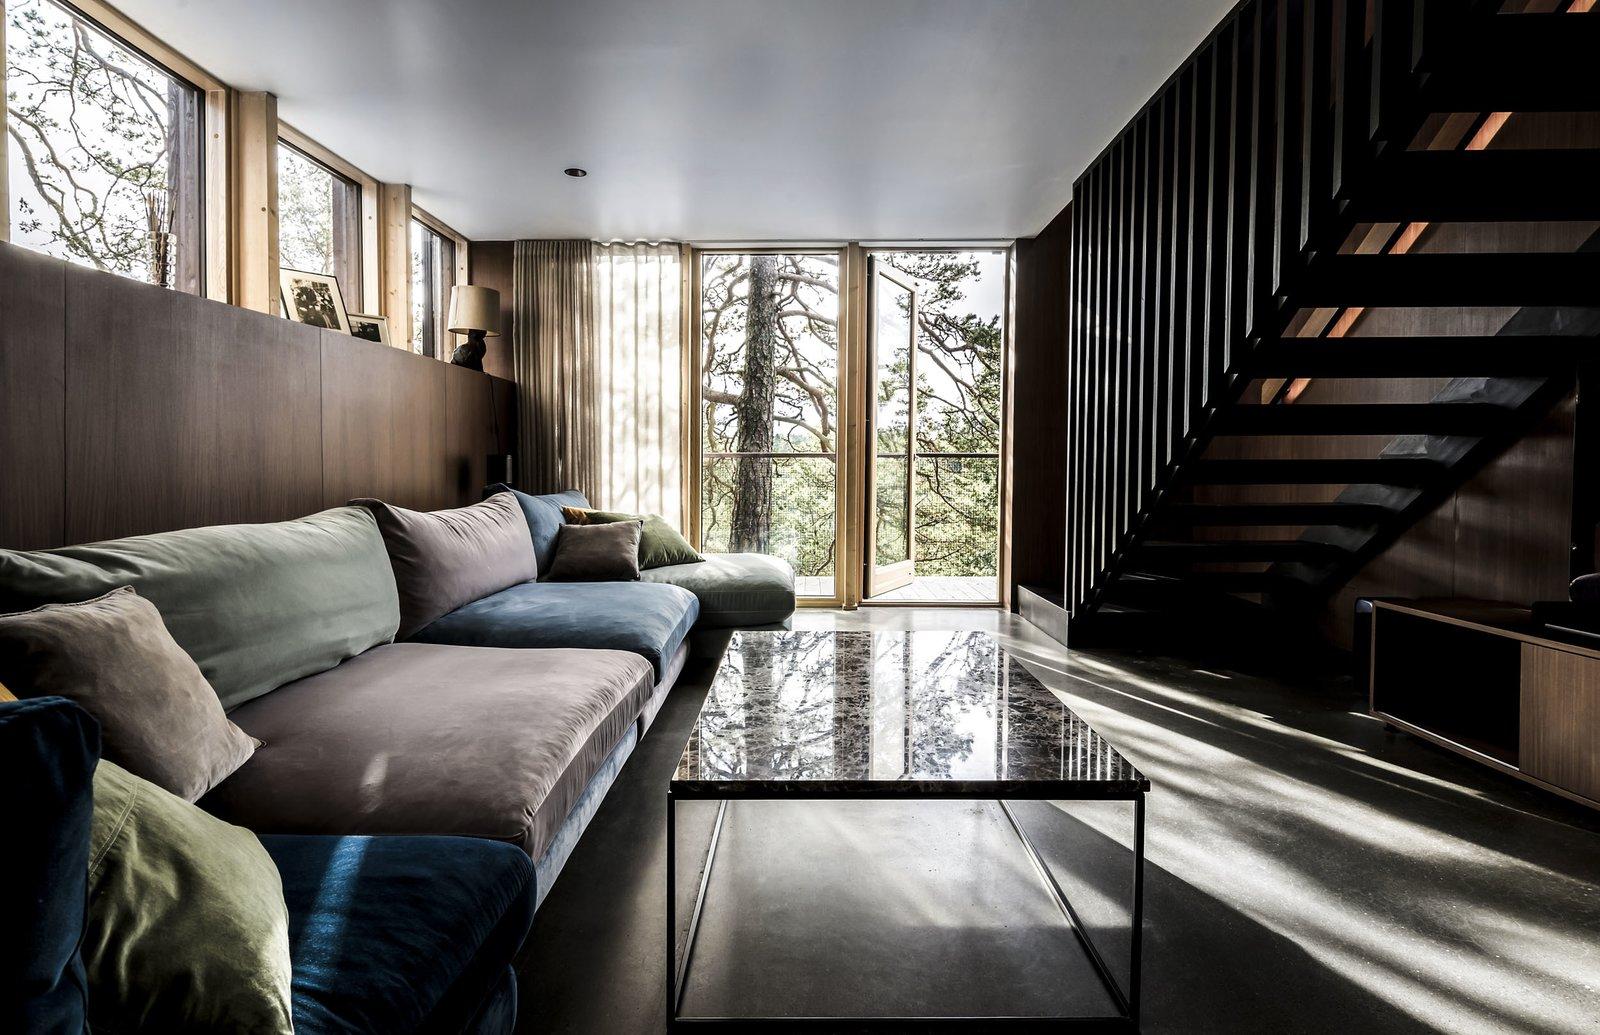 Living Room, Concrete Floor, Ceiling Lighting, and Sofa  Woodland house